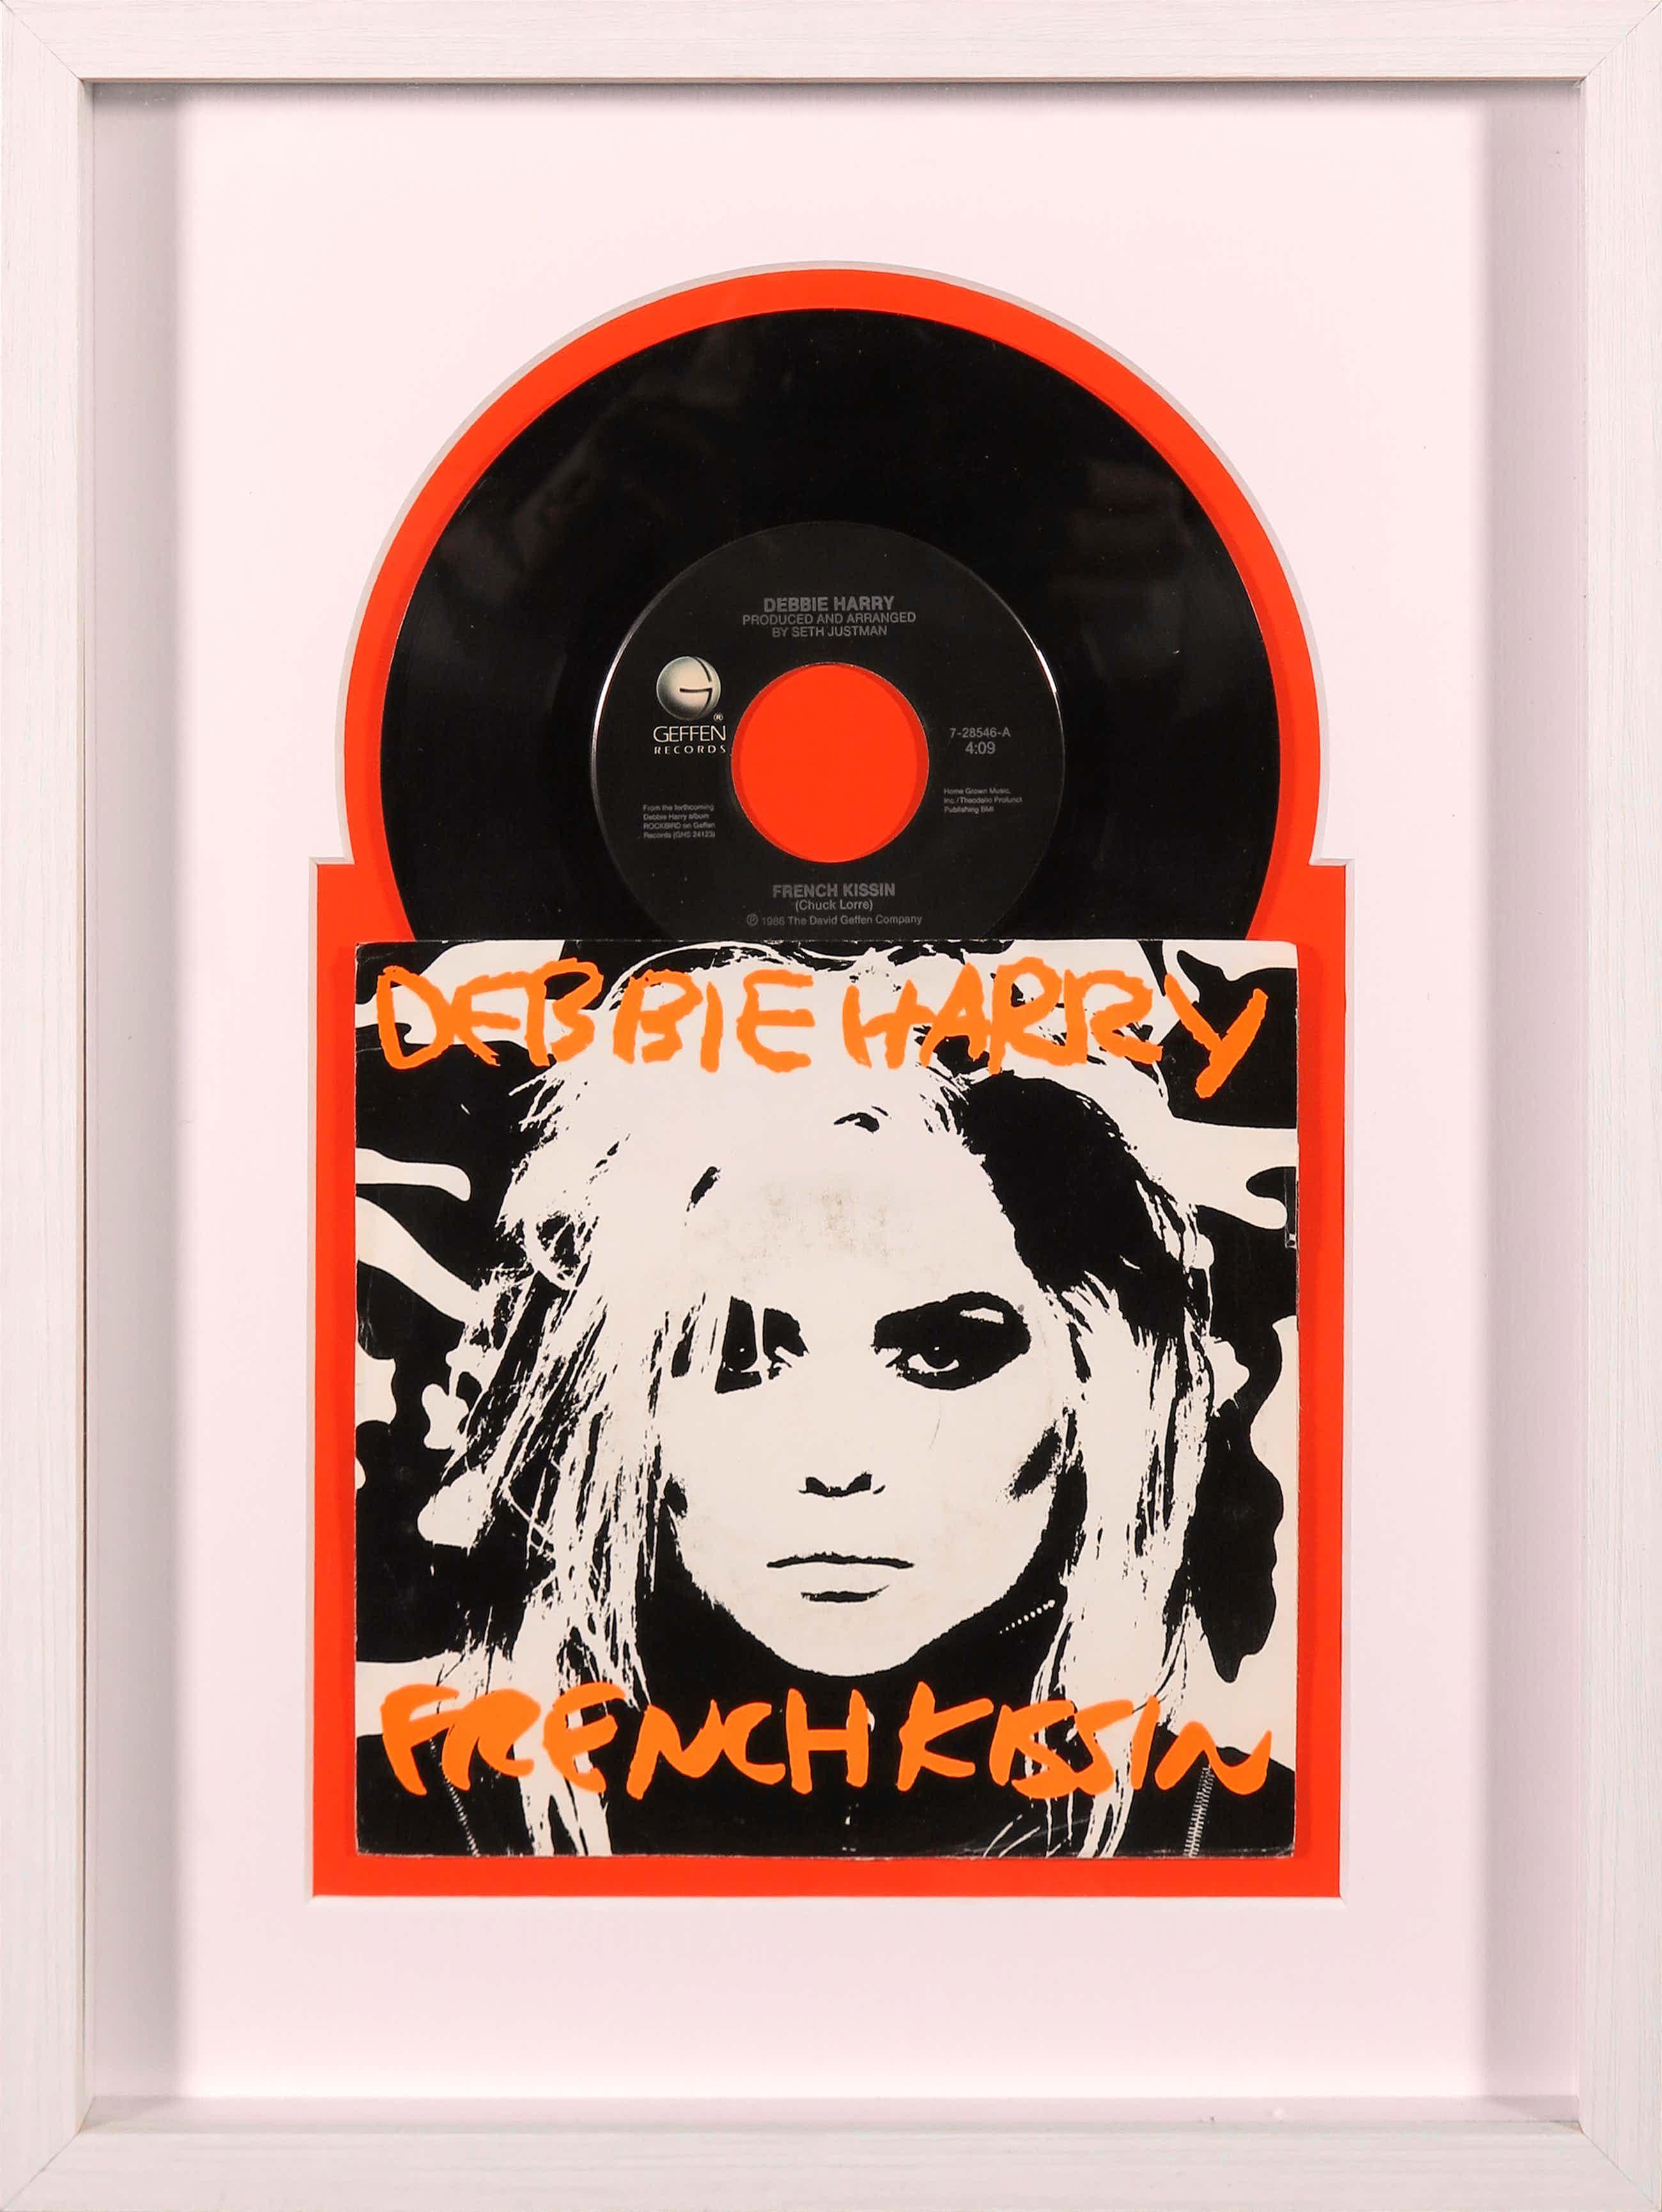 Andy Warhol - French Kissin - Debbie Harry kopen? Bied vanaf 70!